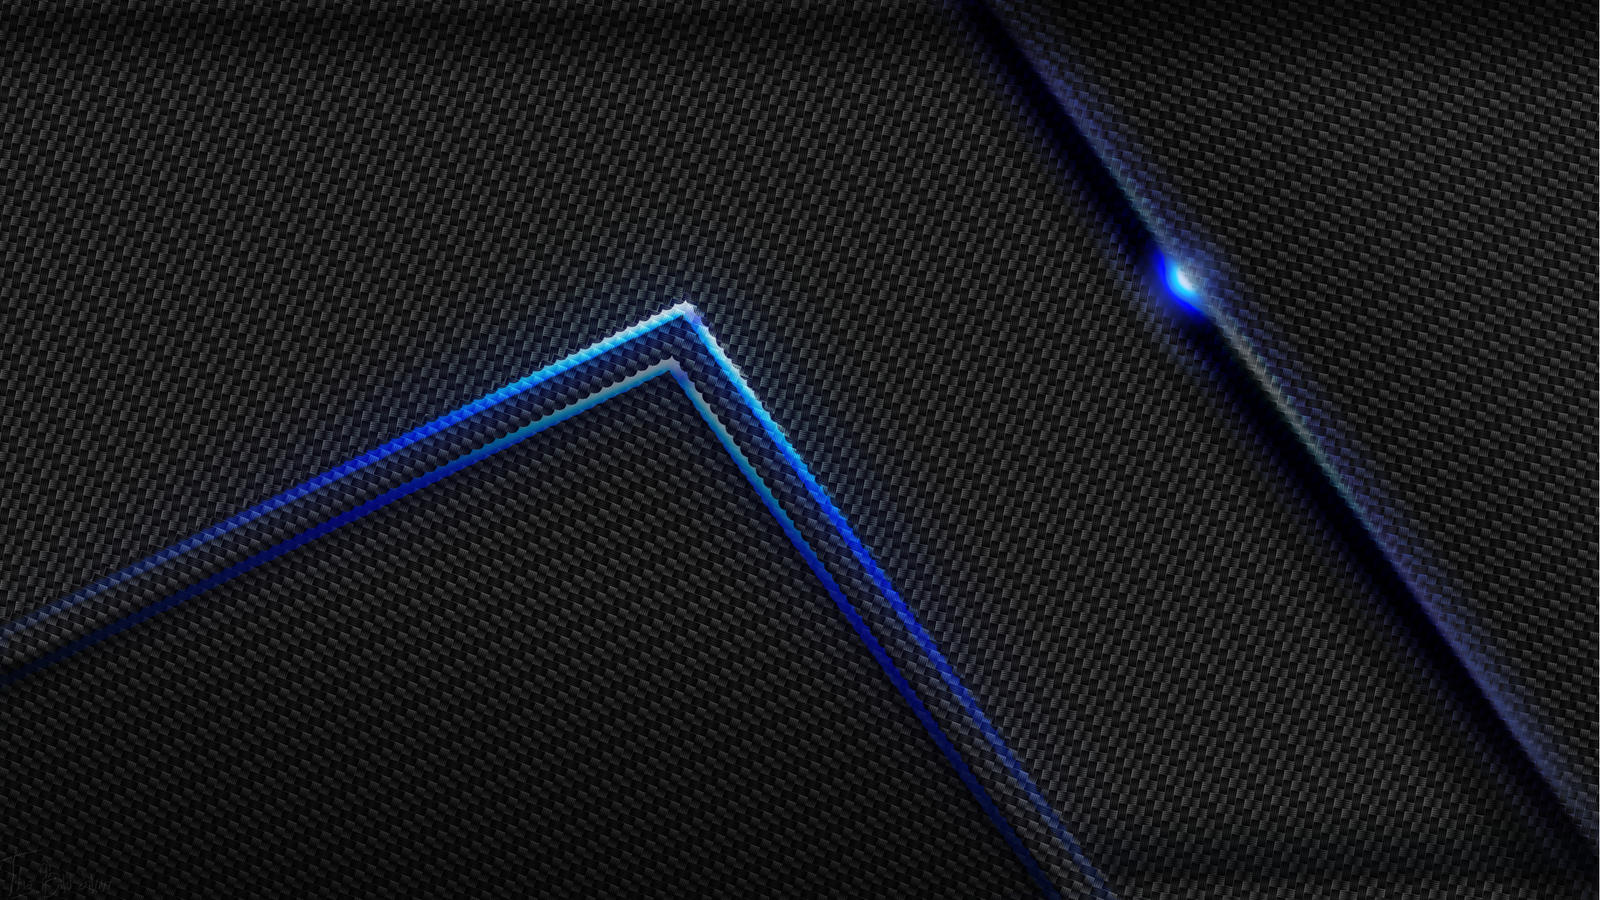 blue led wallpaper - photo #10